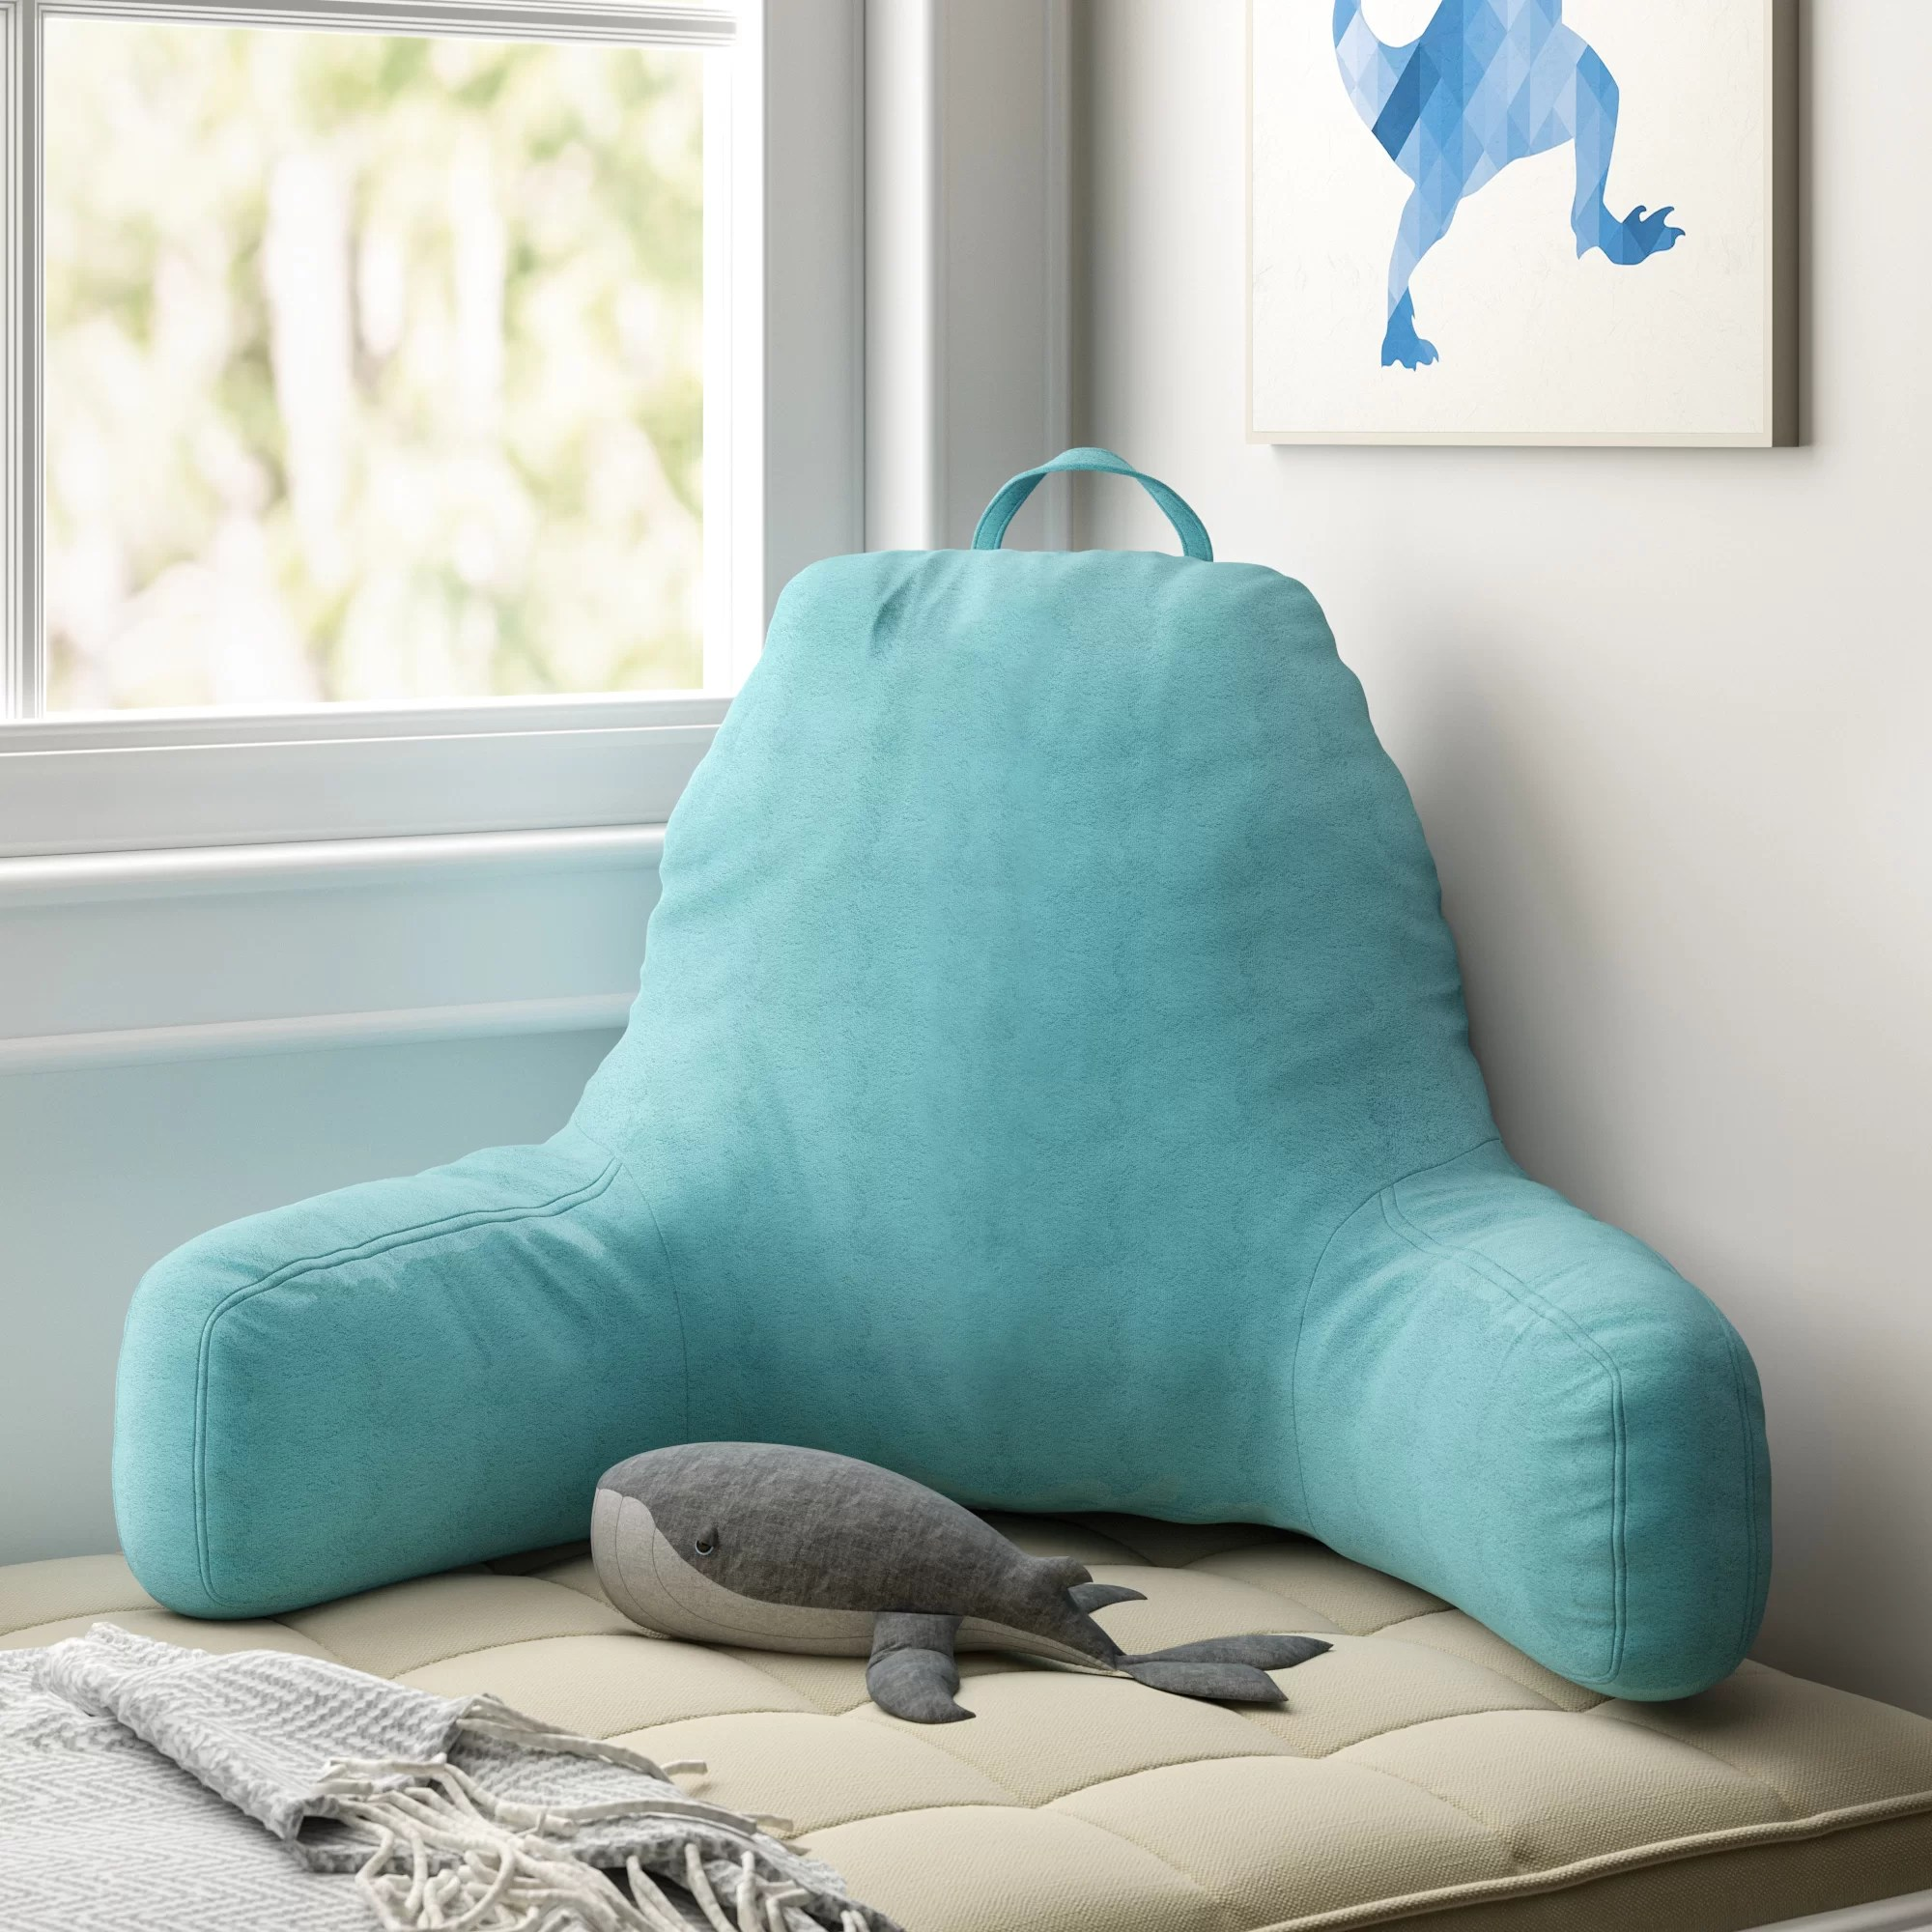 zukowski bed backrest pillow